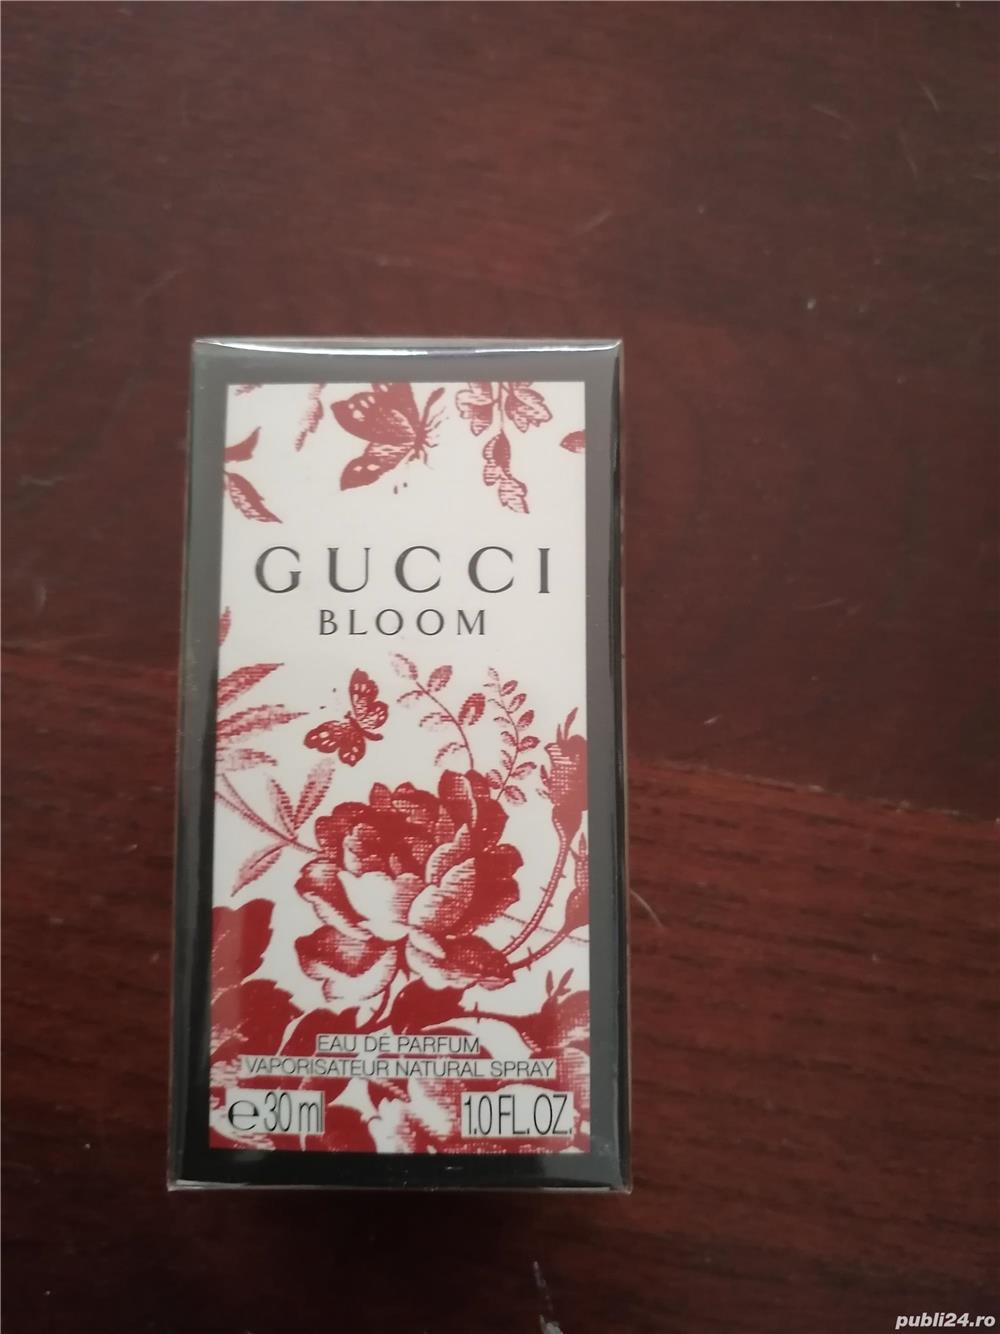 Vând parfum gucci, Bloom, în cutie, tipla, 30ml